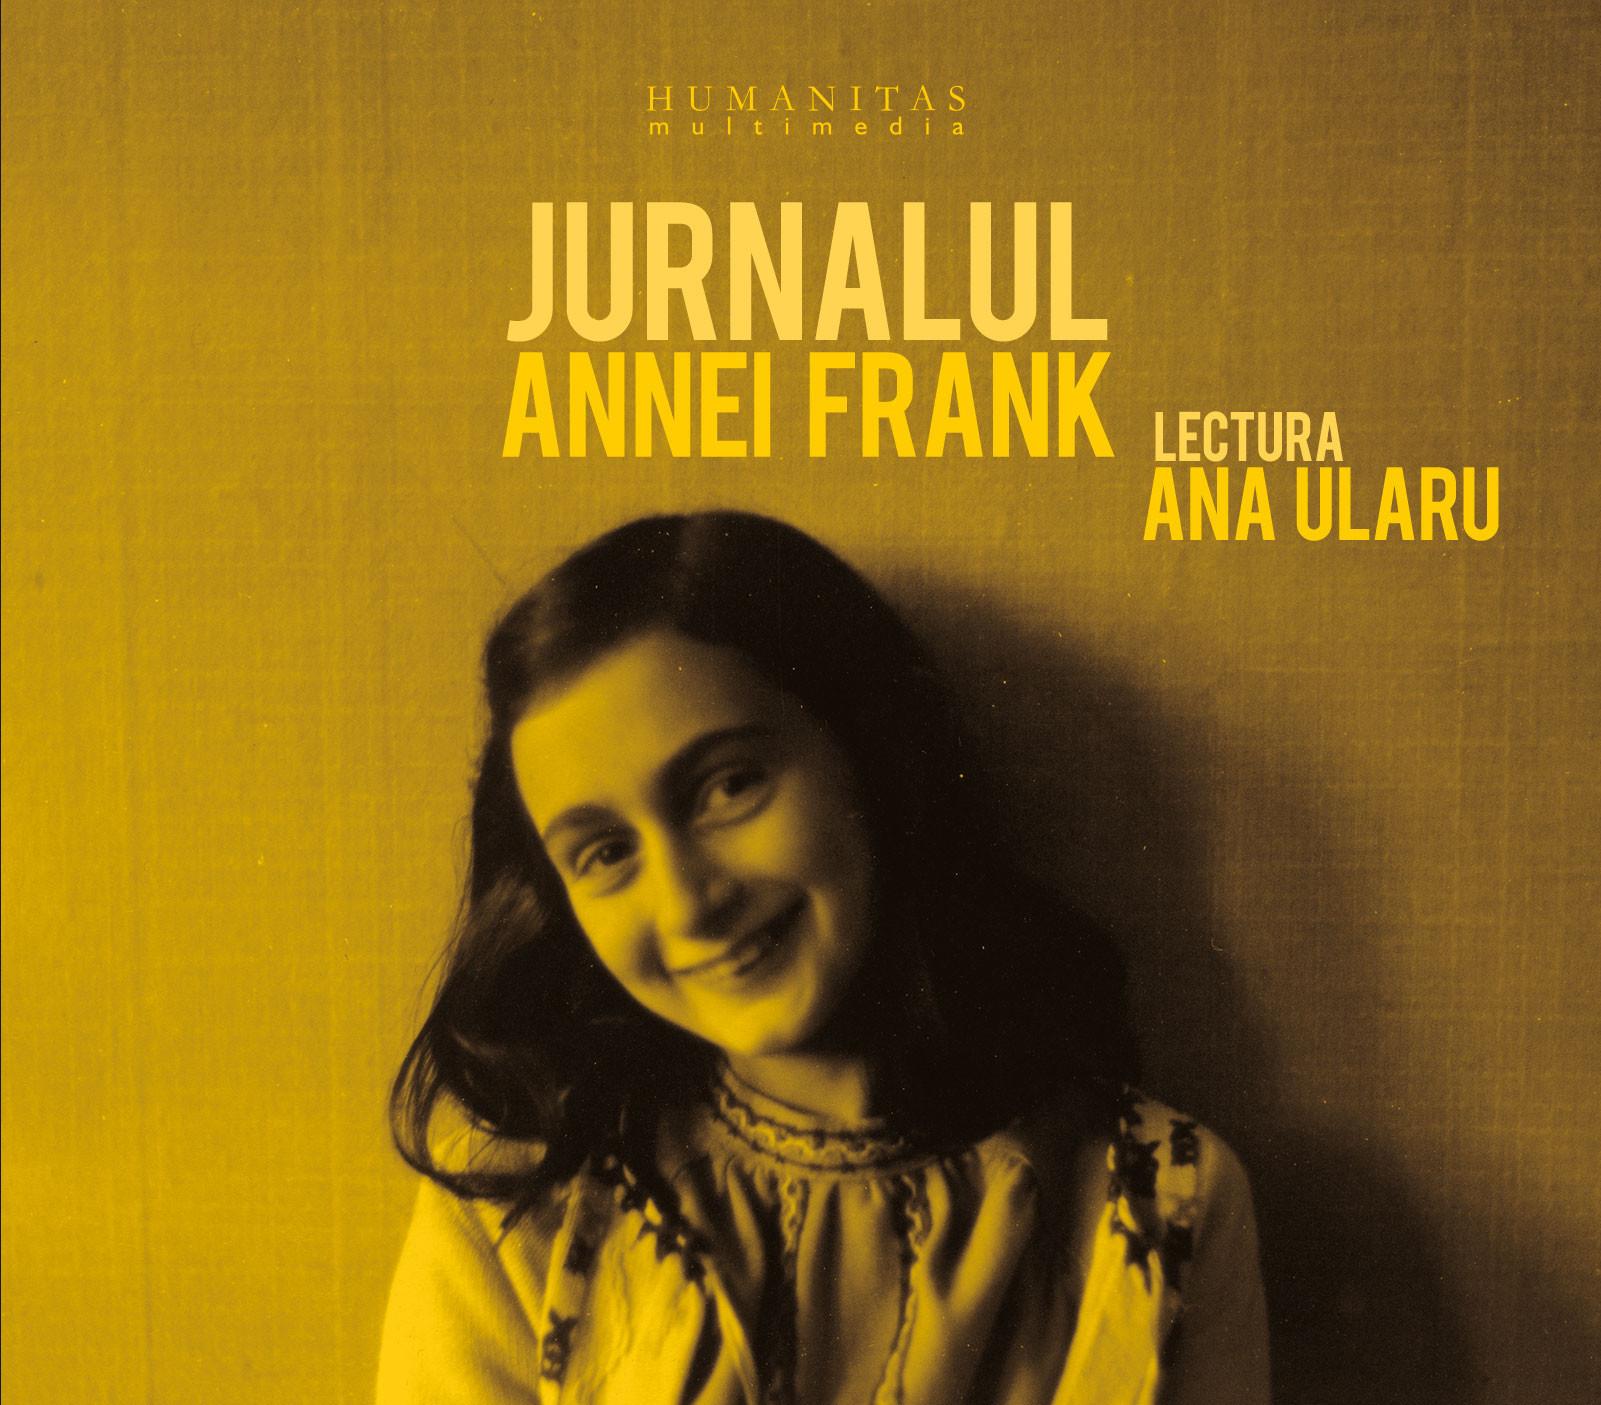 Anne Frank - Jurnalul Annei Frank -